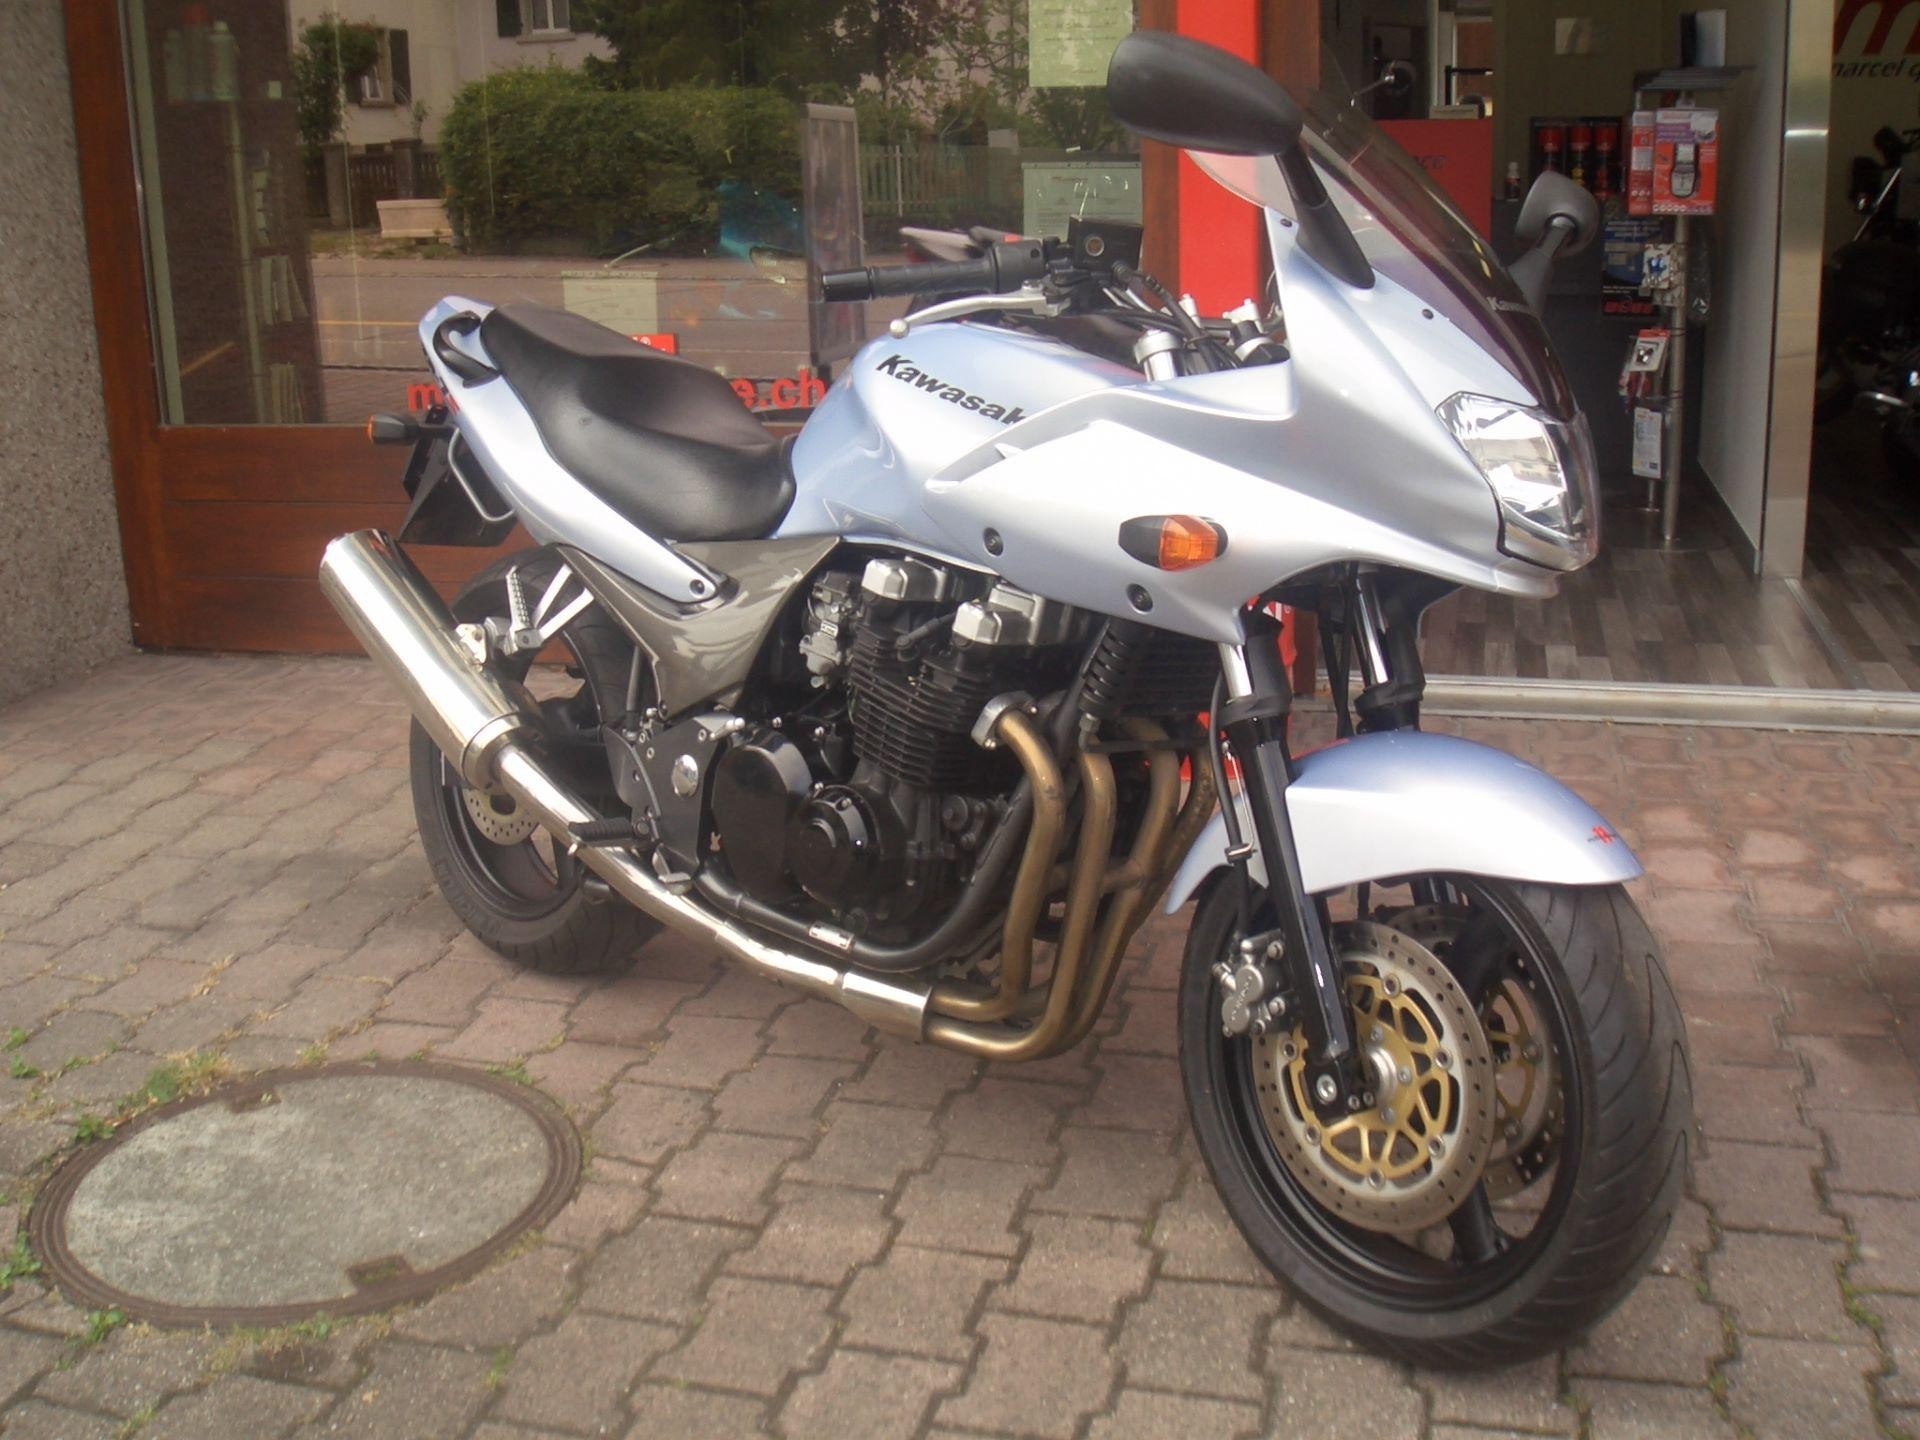 Motorrad Occasion kaufen KAWASAKI ZR-7 Moto Budget GmbH